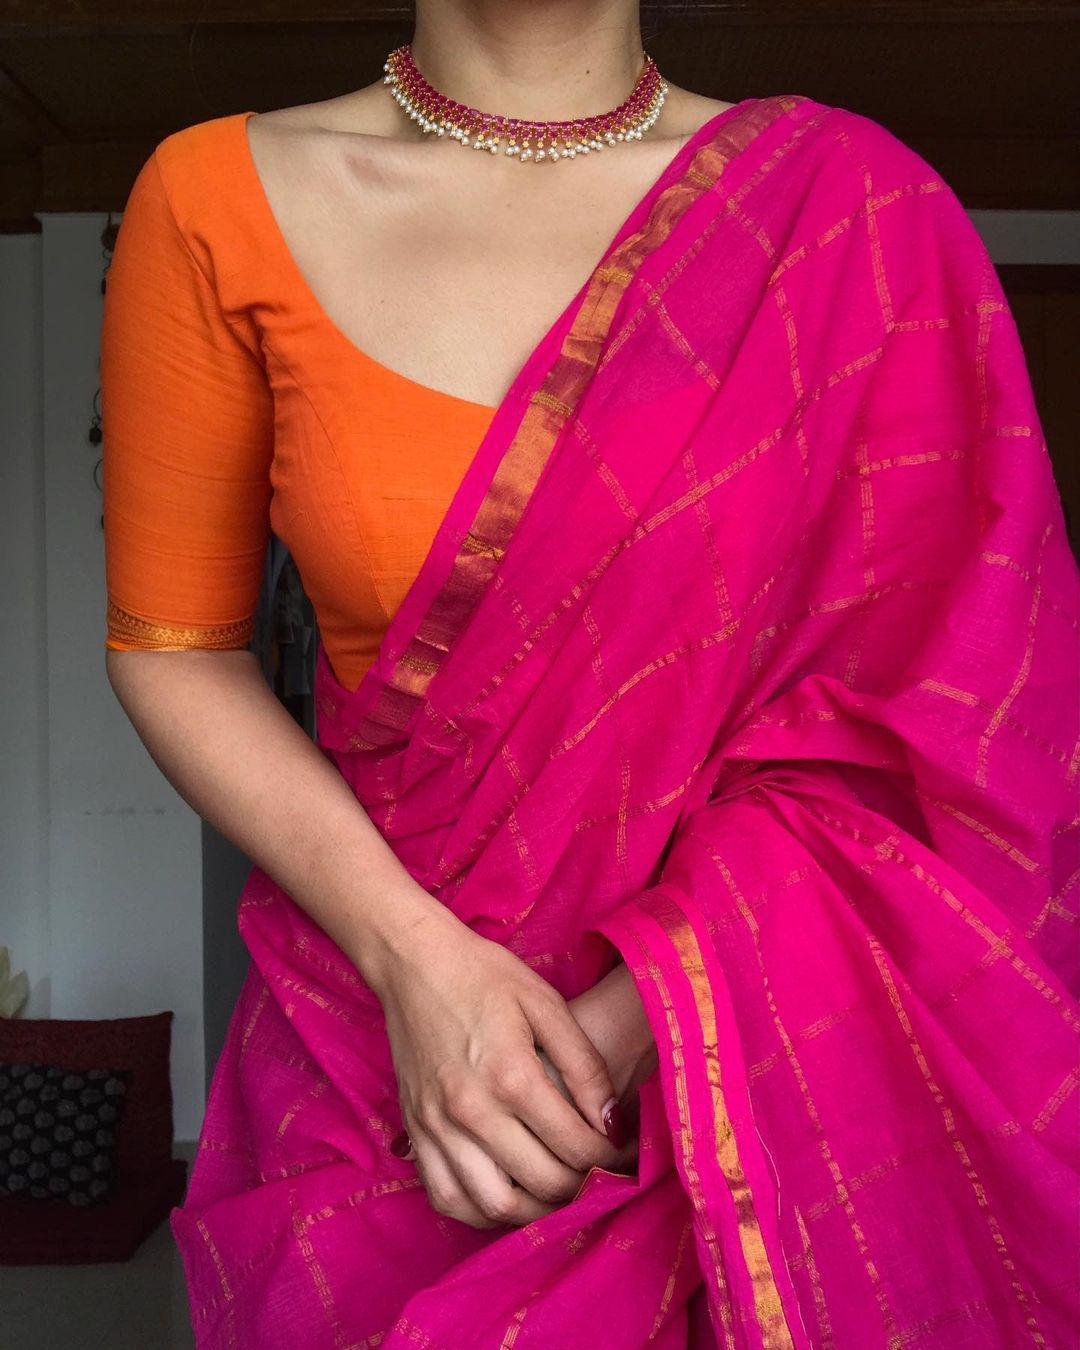 Margazhii On Instagram Madurai Kattam January Edit Available On Website Www Margazhidesigns Com J In 2021 India Clothes Ladies Tops Fashion Blouse Designs